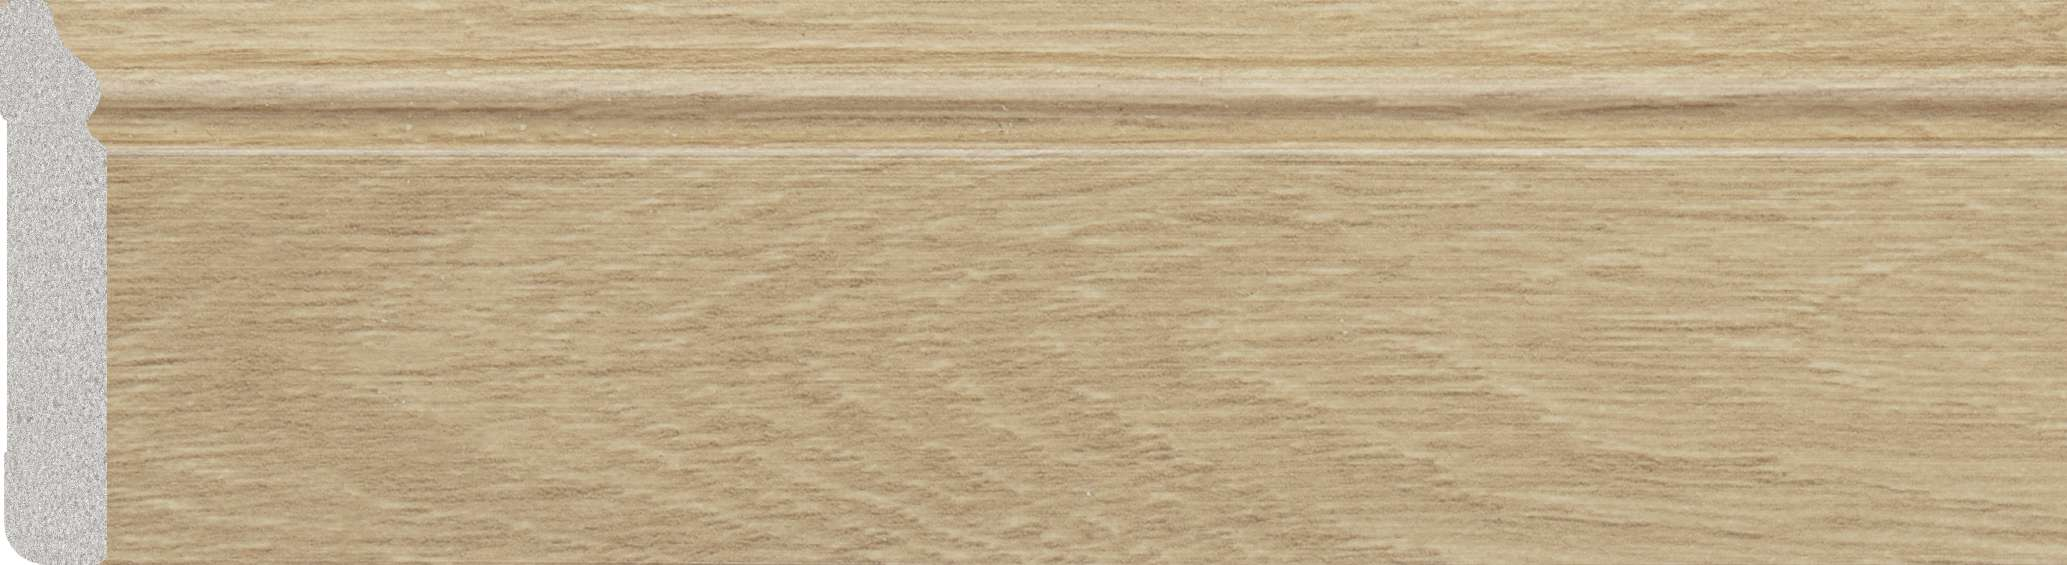 oak plastic skirting board